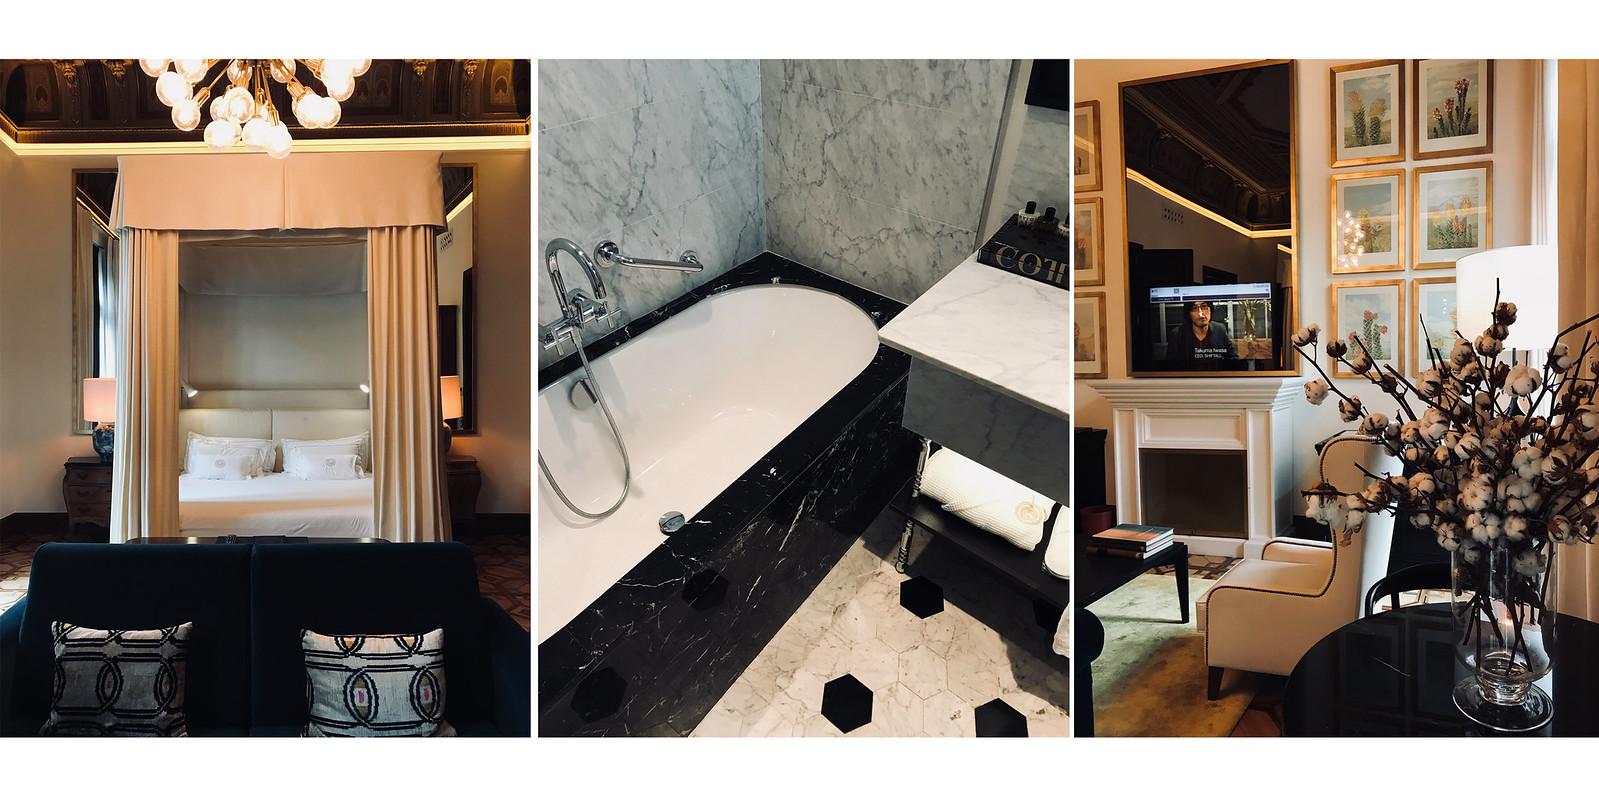 09_cotton_house_barcelona_hotel_restaurante_lujo_influencer_theguestgirl_laura_santolaria